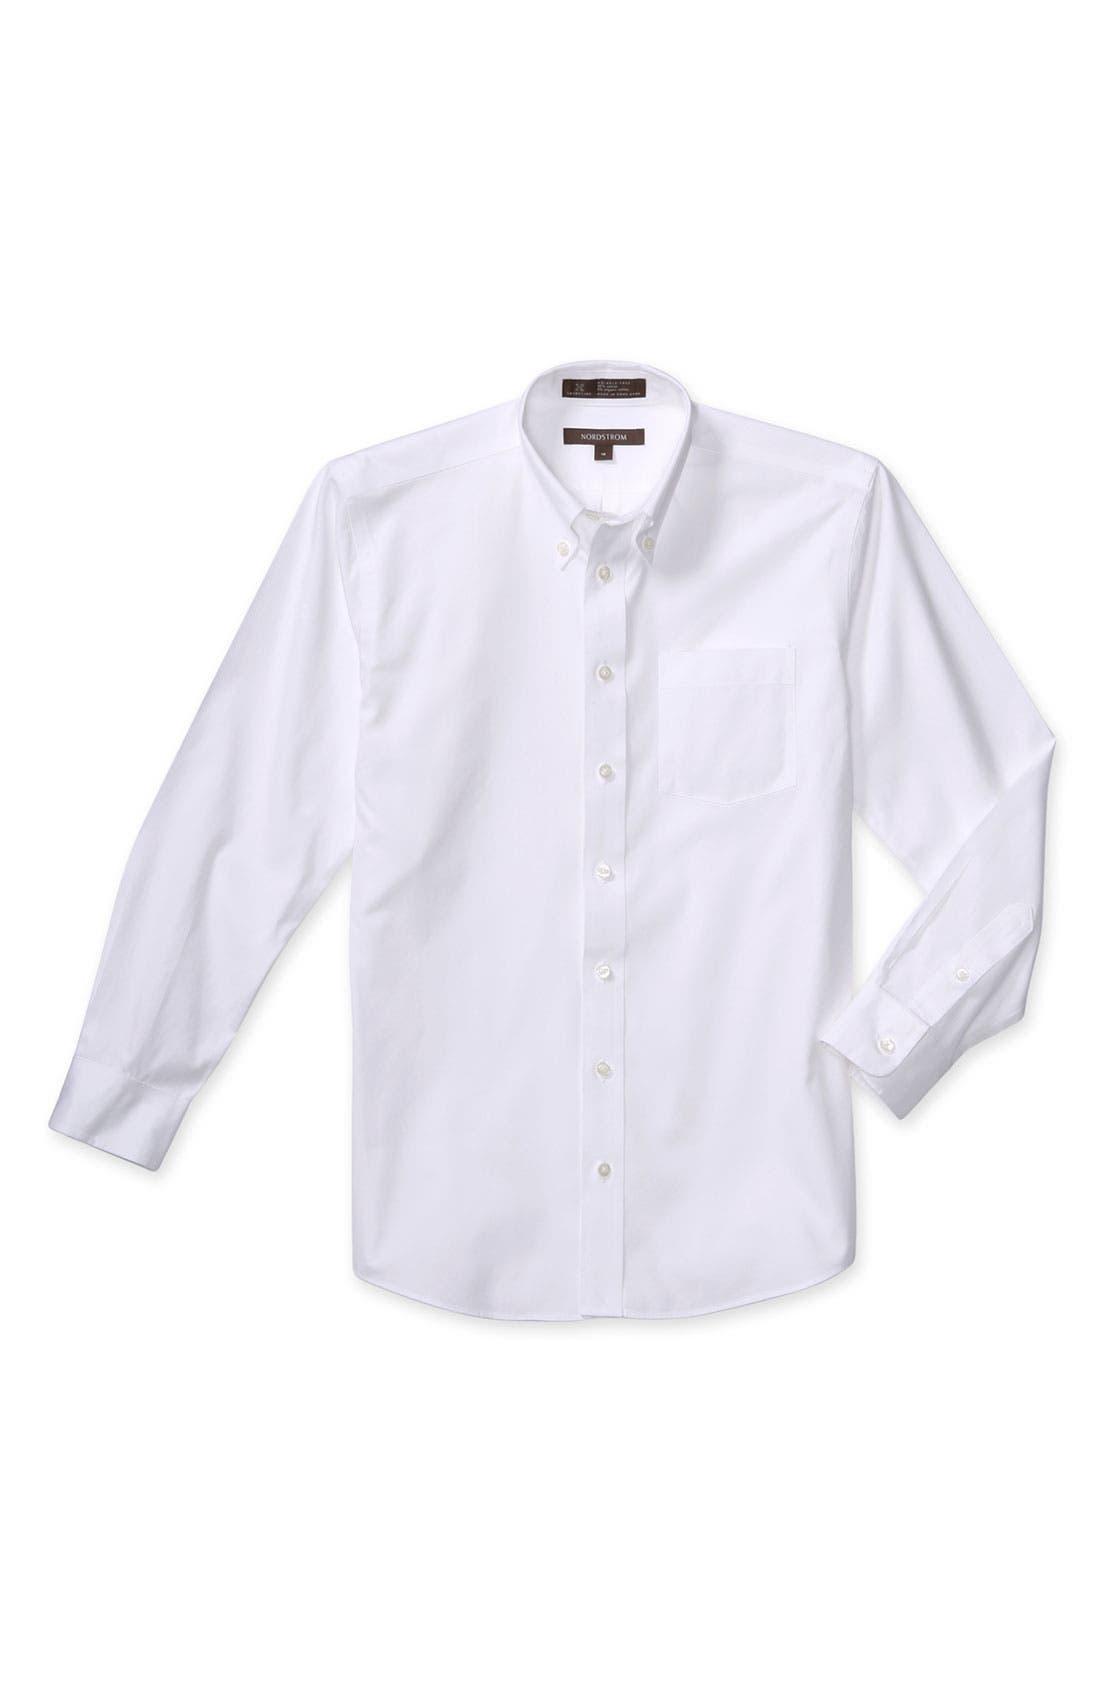 Alternate Image 1 Selected - Nordstrom Smartcare™ Long Sleeve Oxford Shirt (Big Boys)